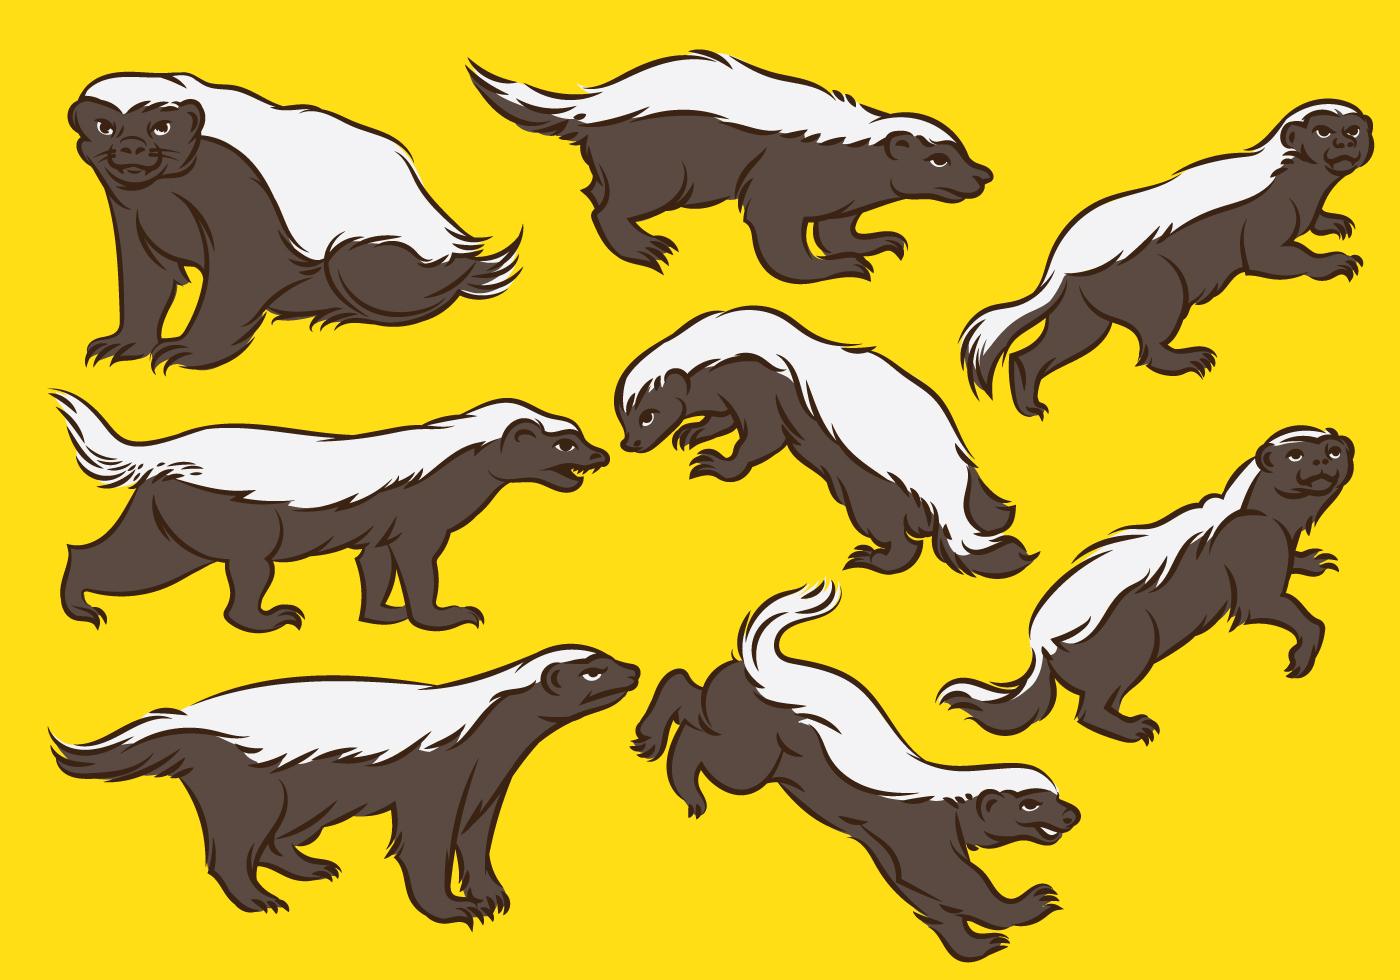 Honey Badger Cartoon - Download Free Vector Art, Stock ...  Honey Badger Ca...